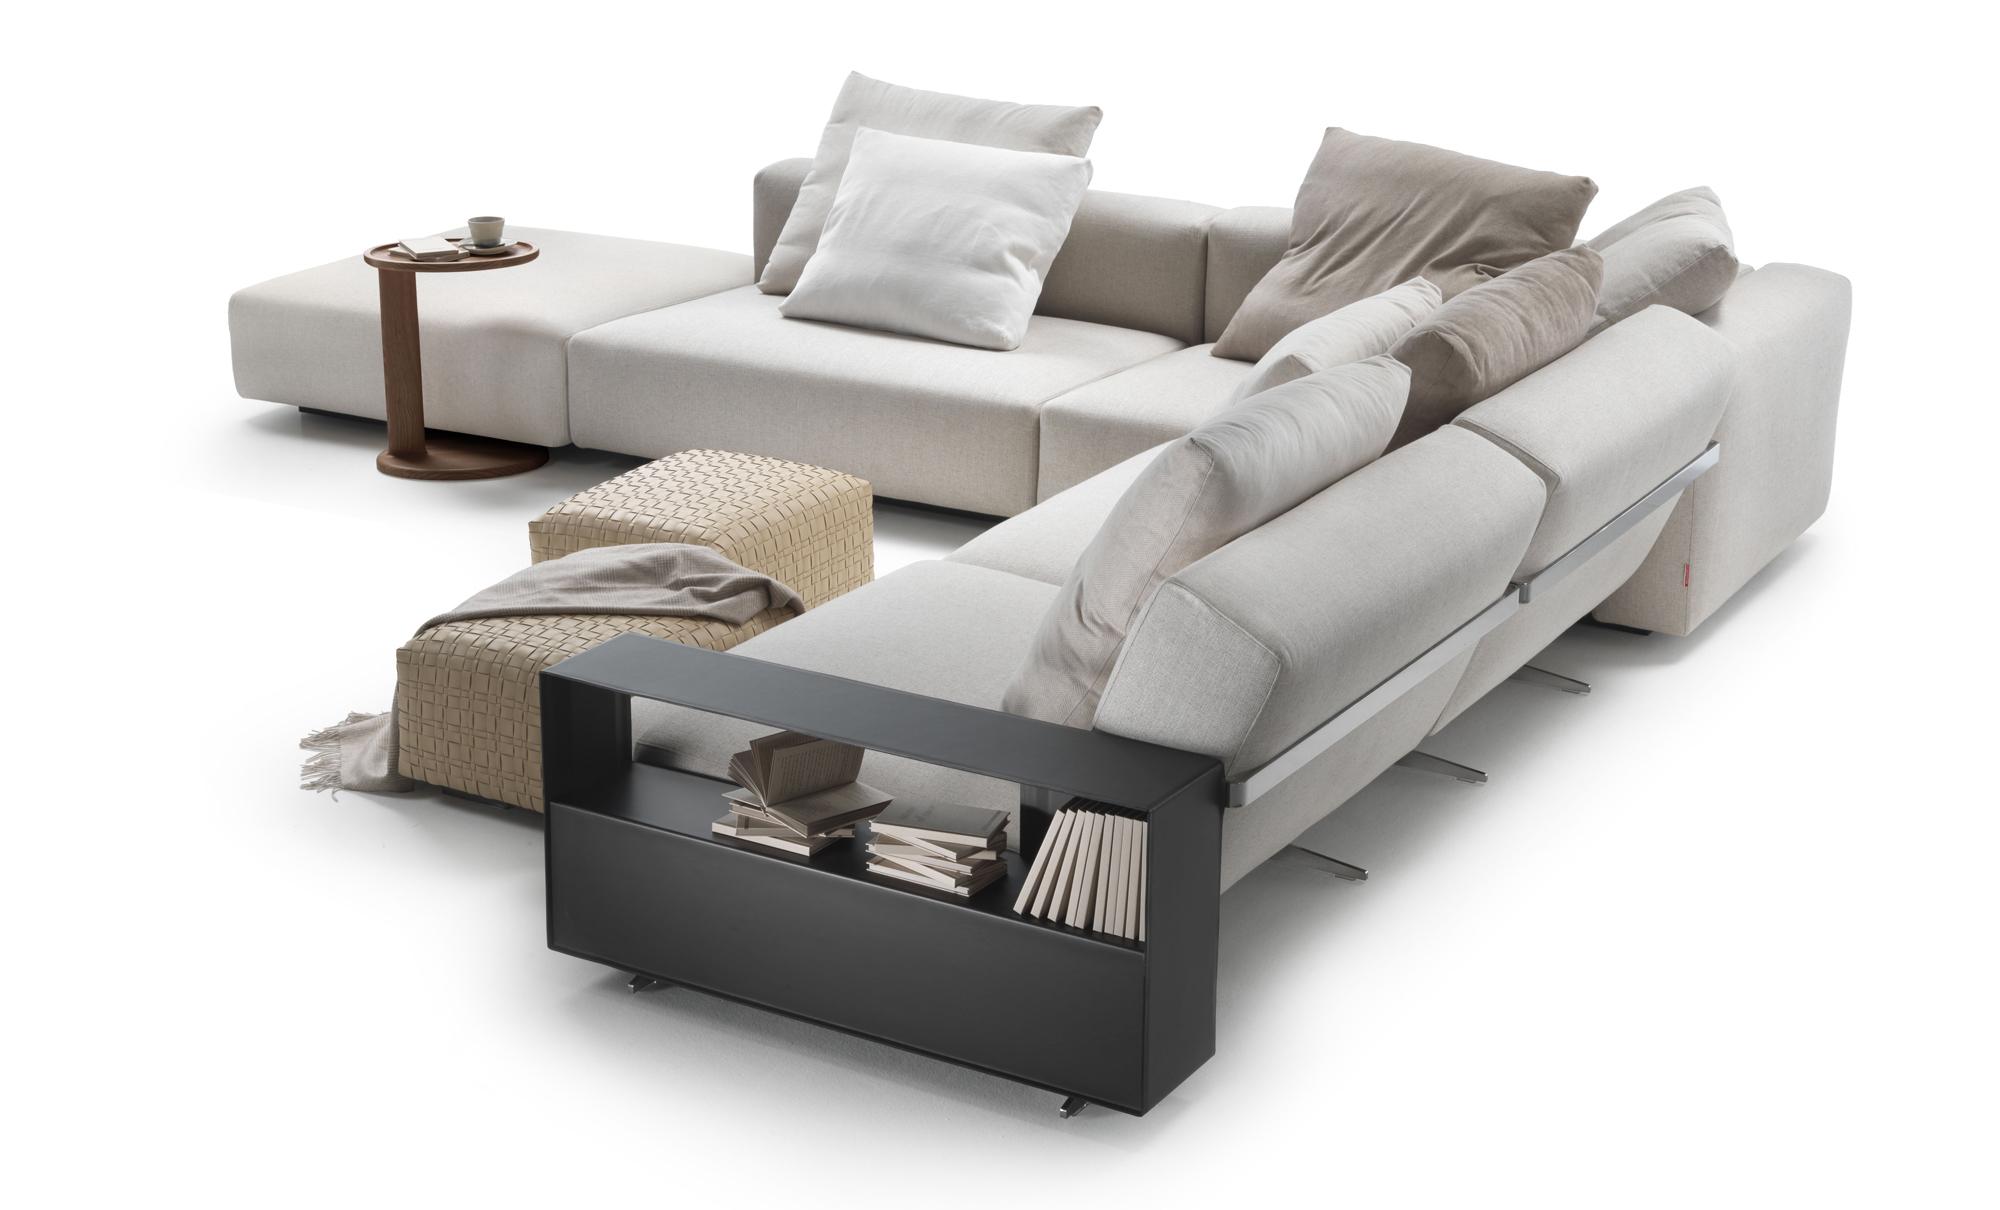 Lario modular sofa fanuli furniture for Flexform divani outlet